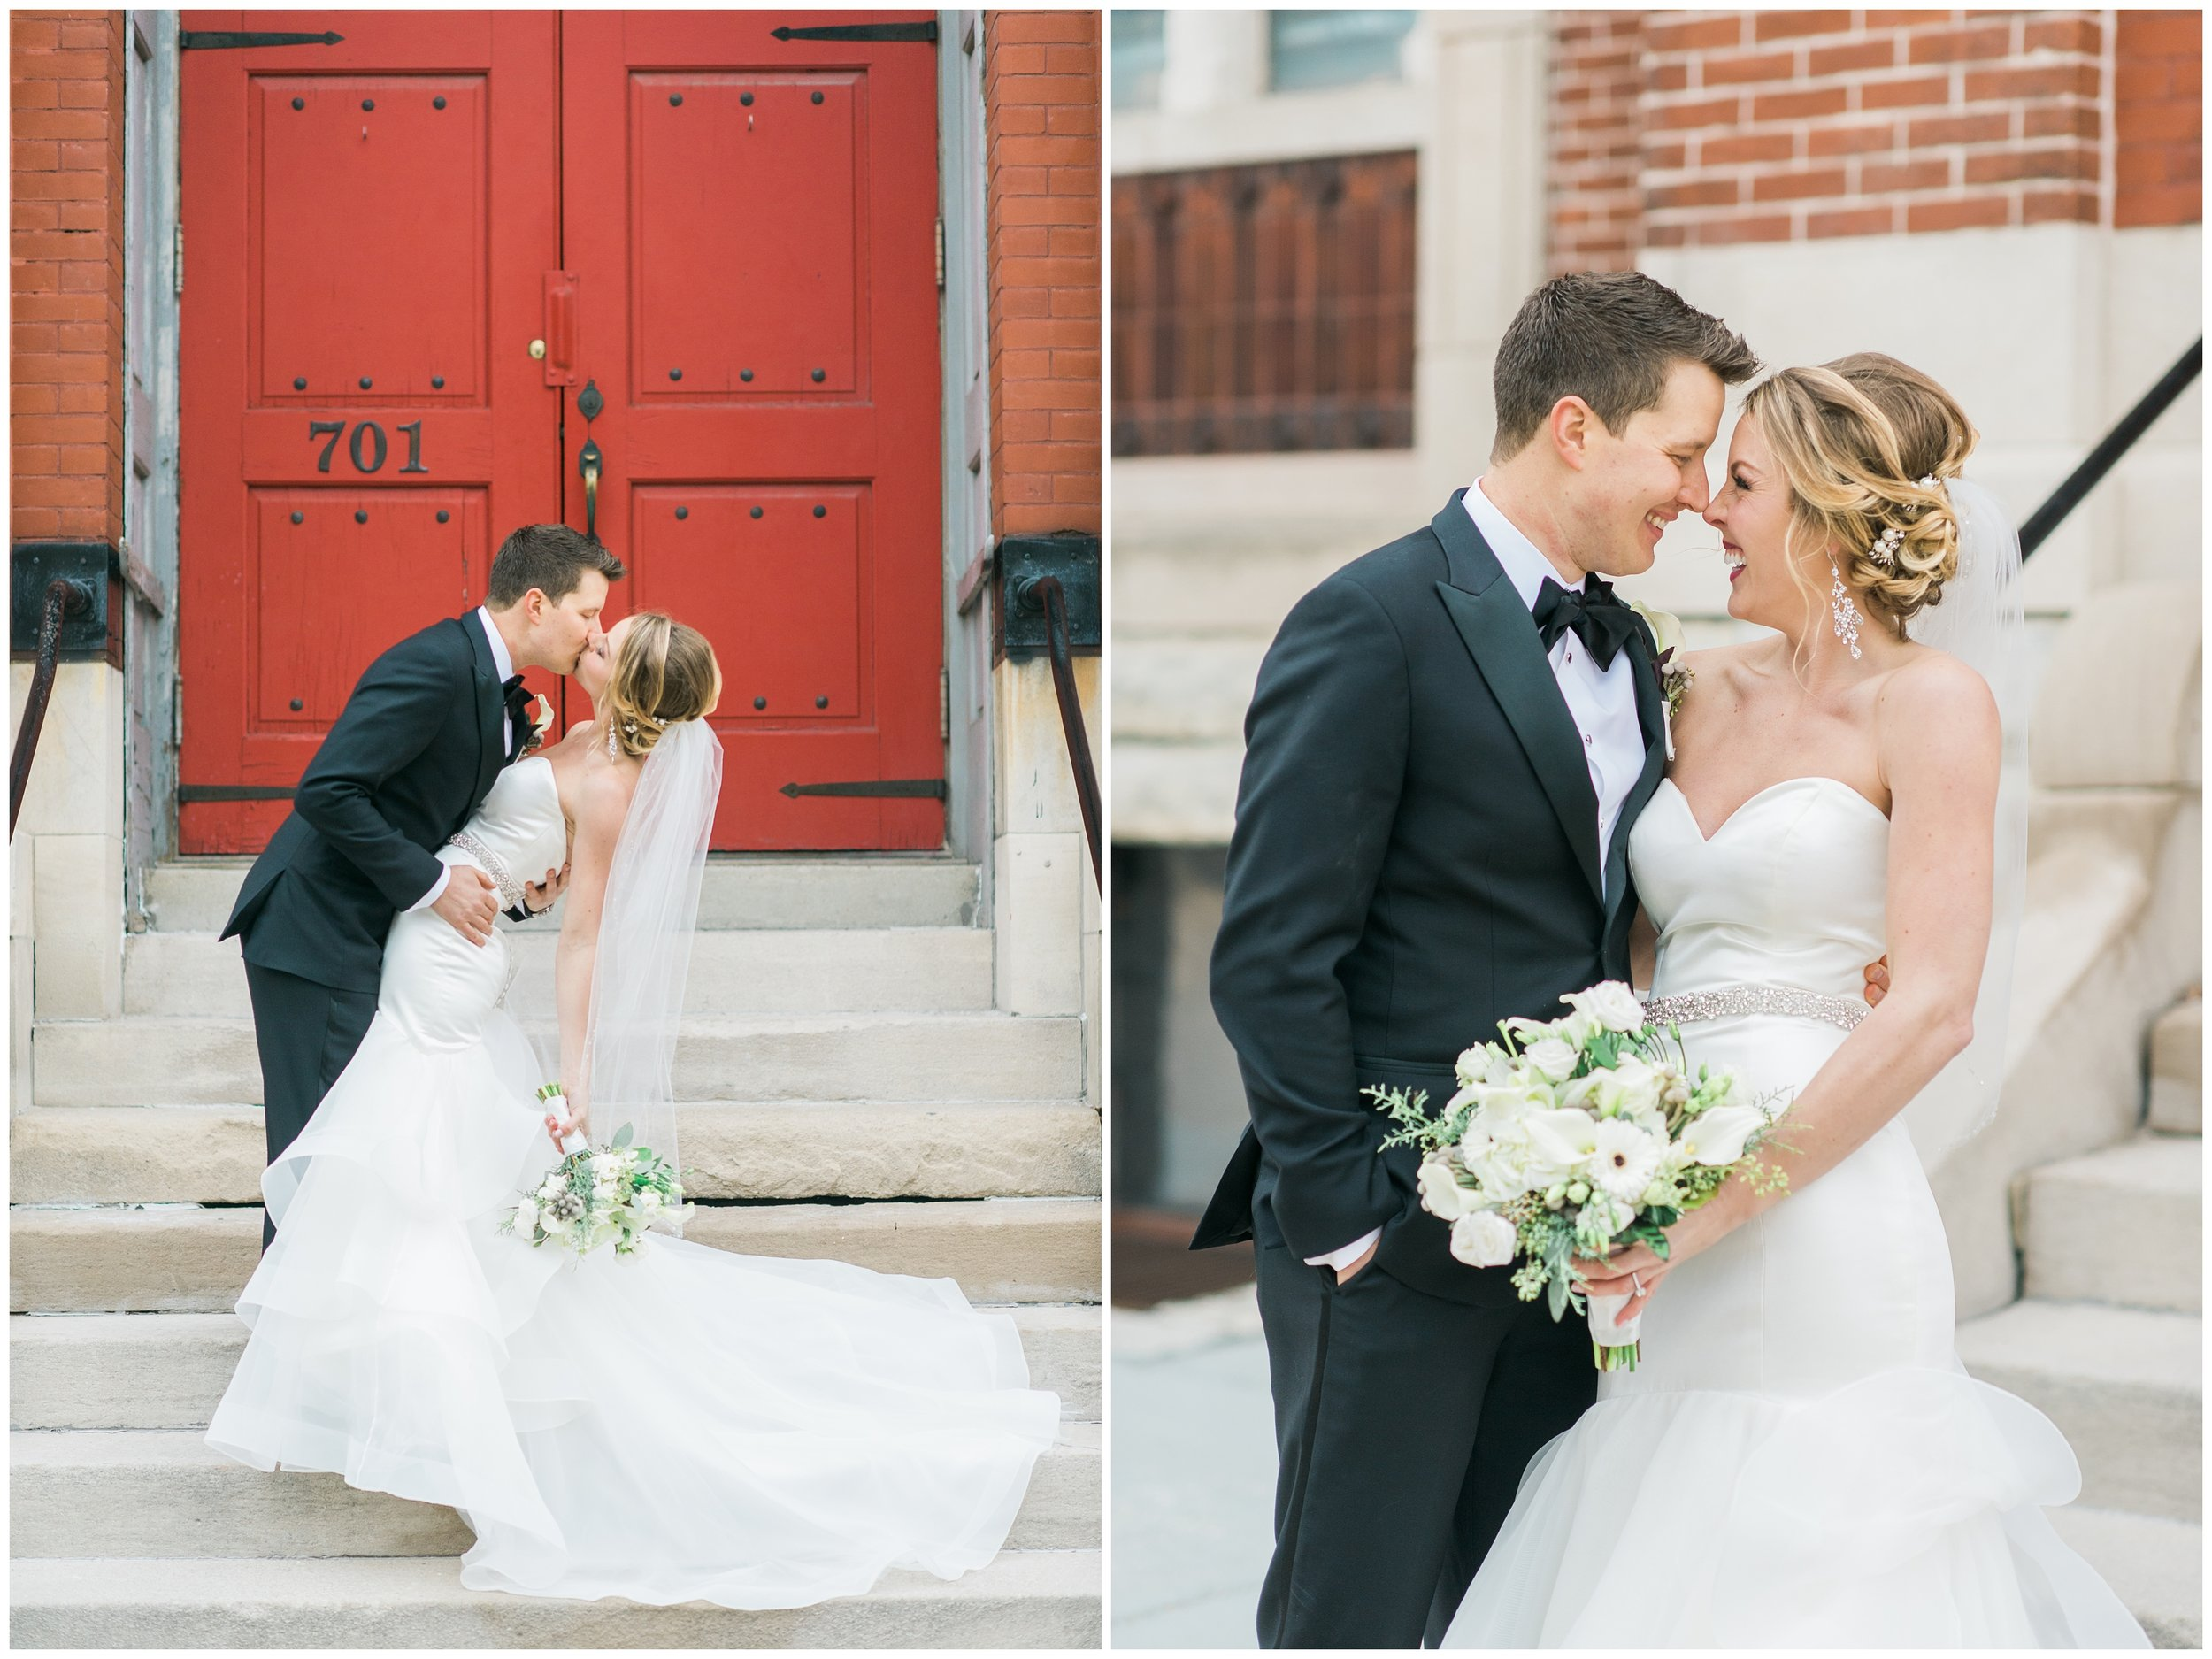 Rebecca_Bridges_Photography_Indianapolis_Wedding_Photographer_5826.jpg